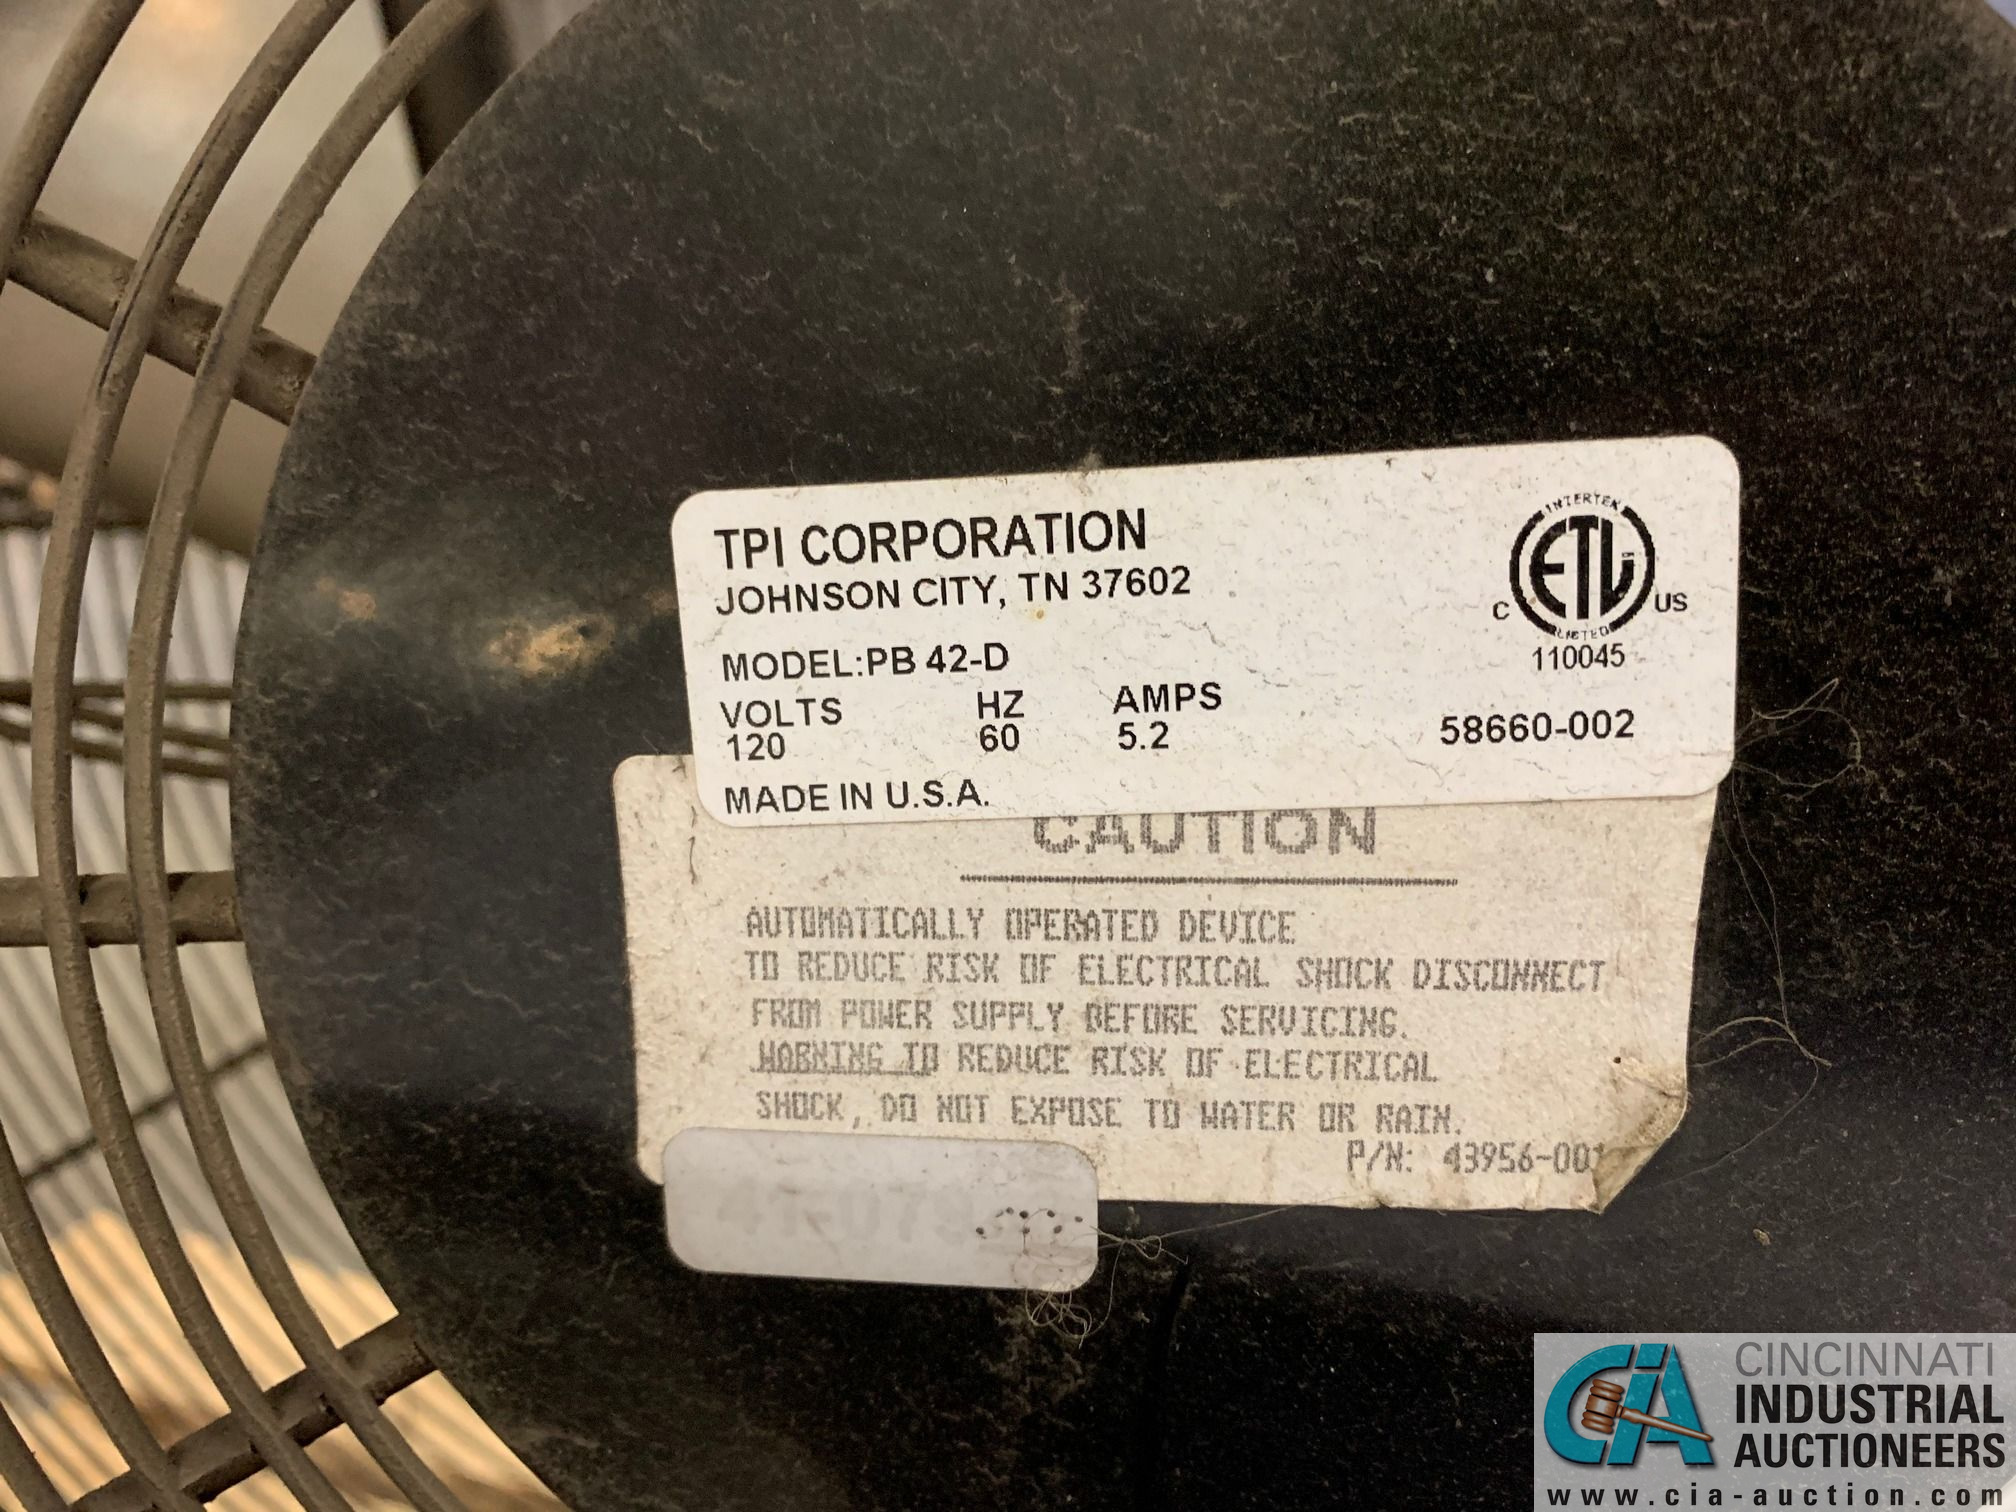 "42"" TPI PB 42-D PORTABLE DRUM FANS (5400 OAKLEY INDUSTRIAL BLVD., FAIRBURN, GA 30213) - Image 5 of 6"